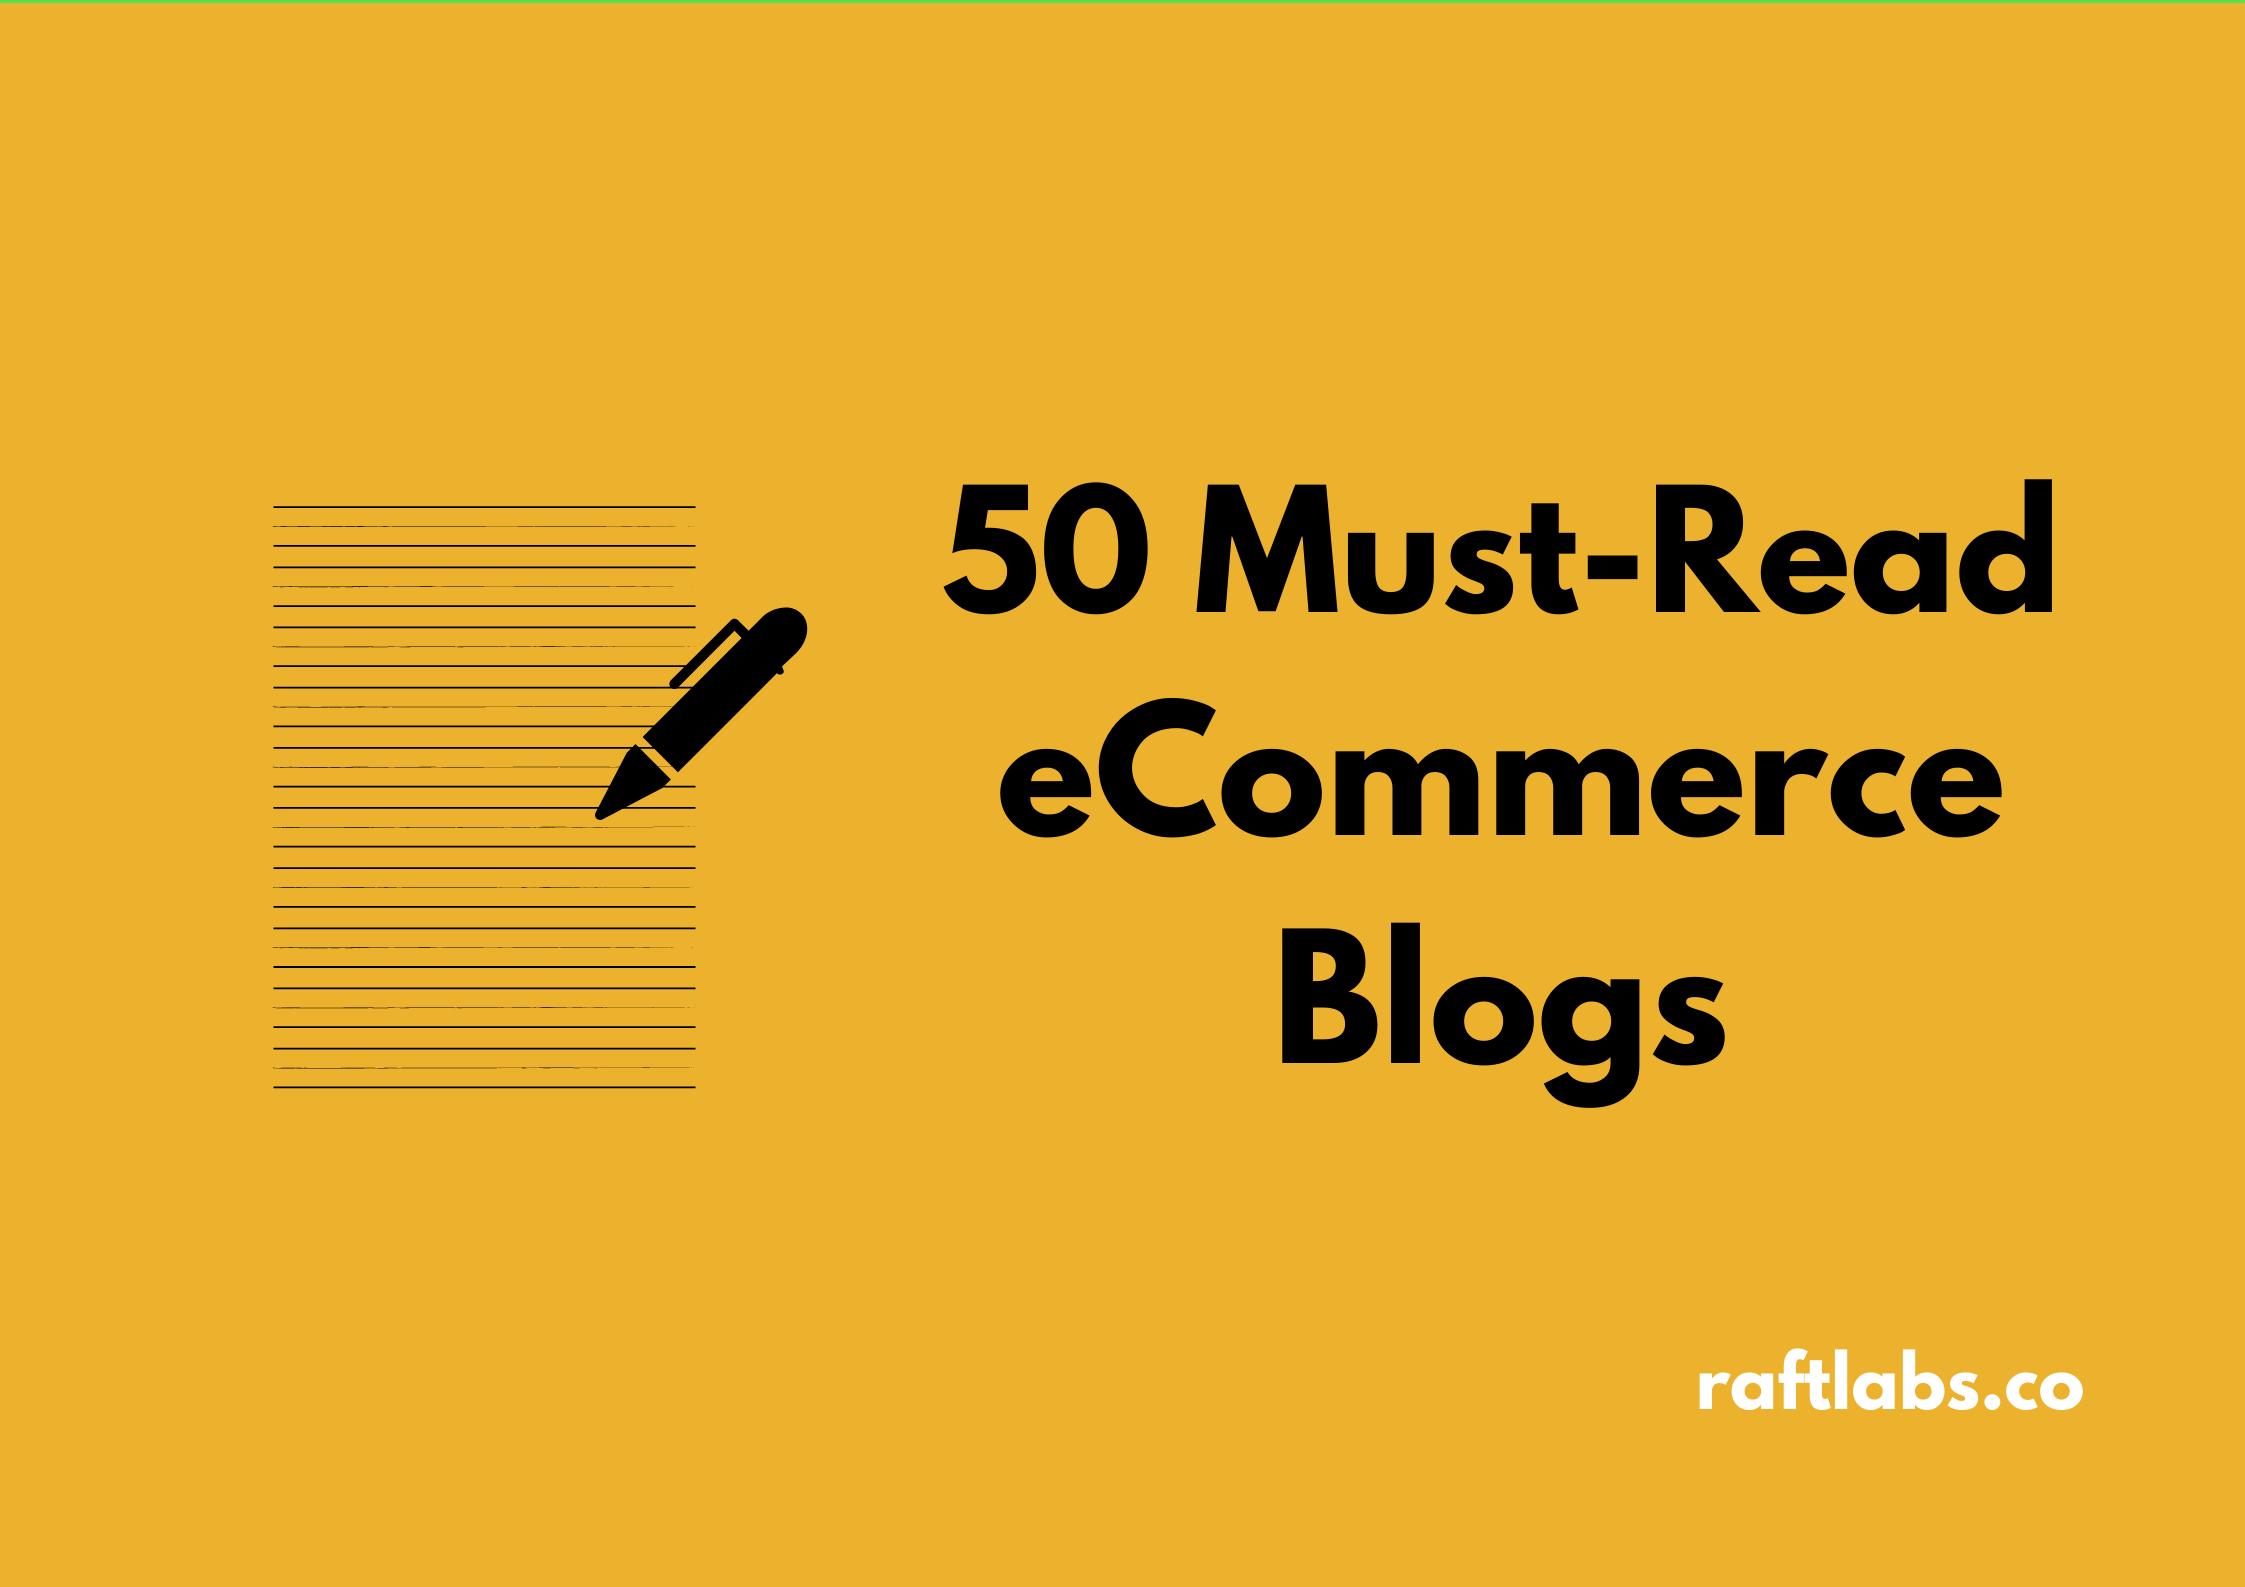 Handpicked list of best eCommerce Blogs| raftlabs